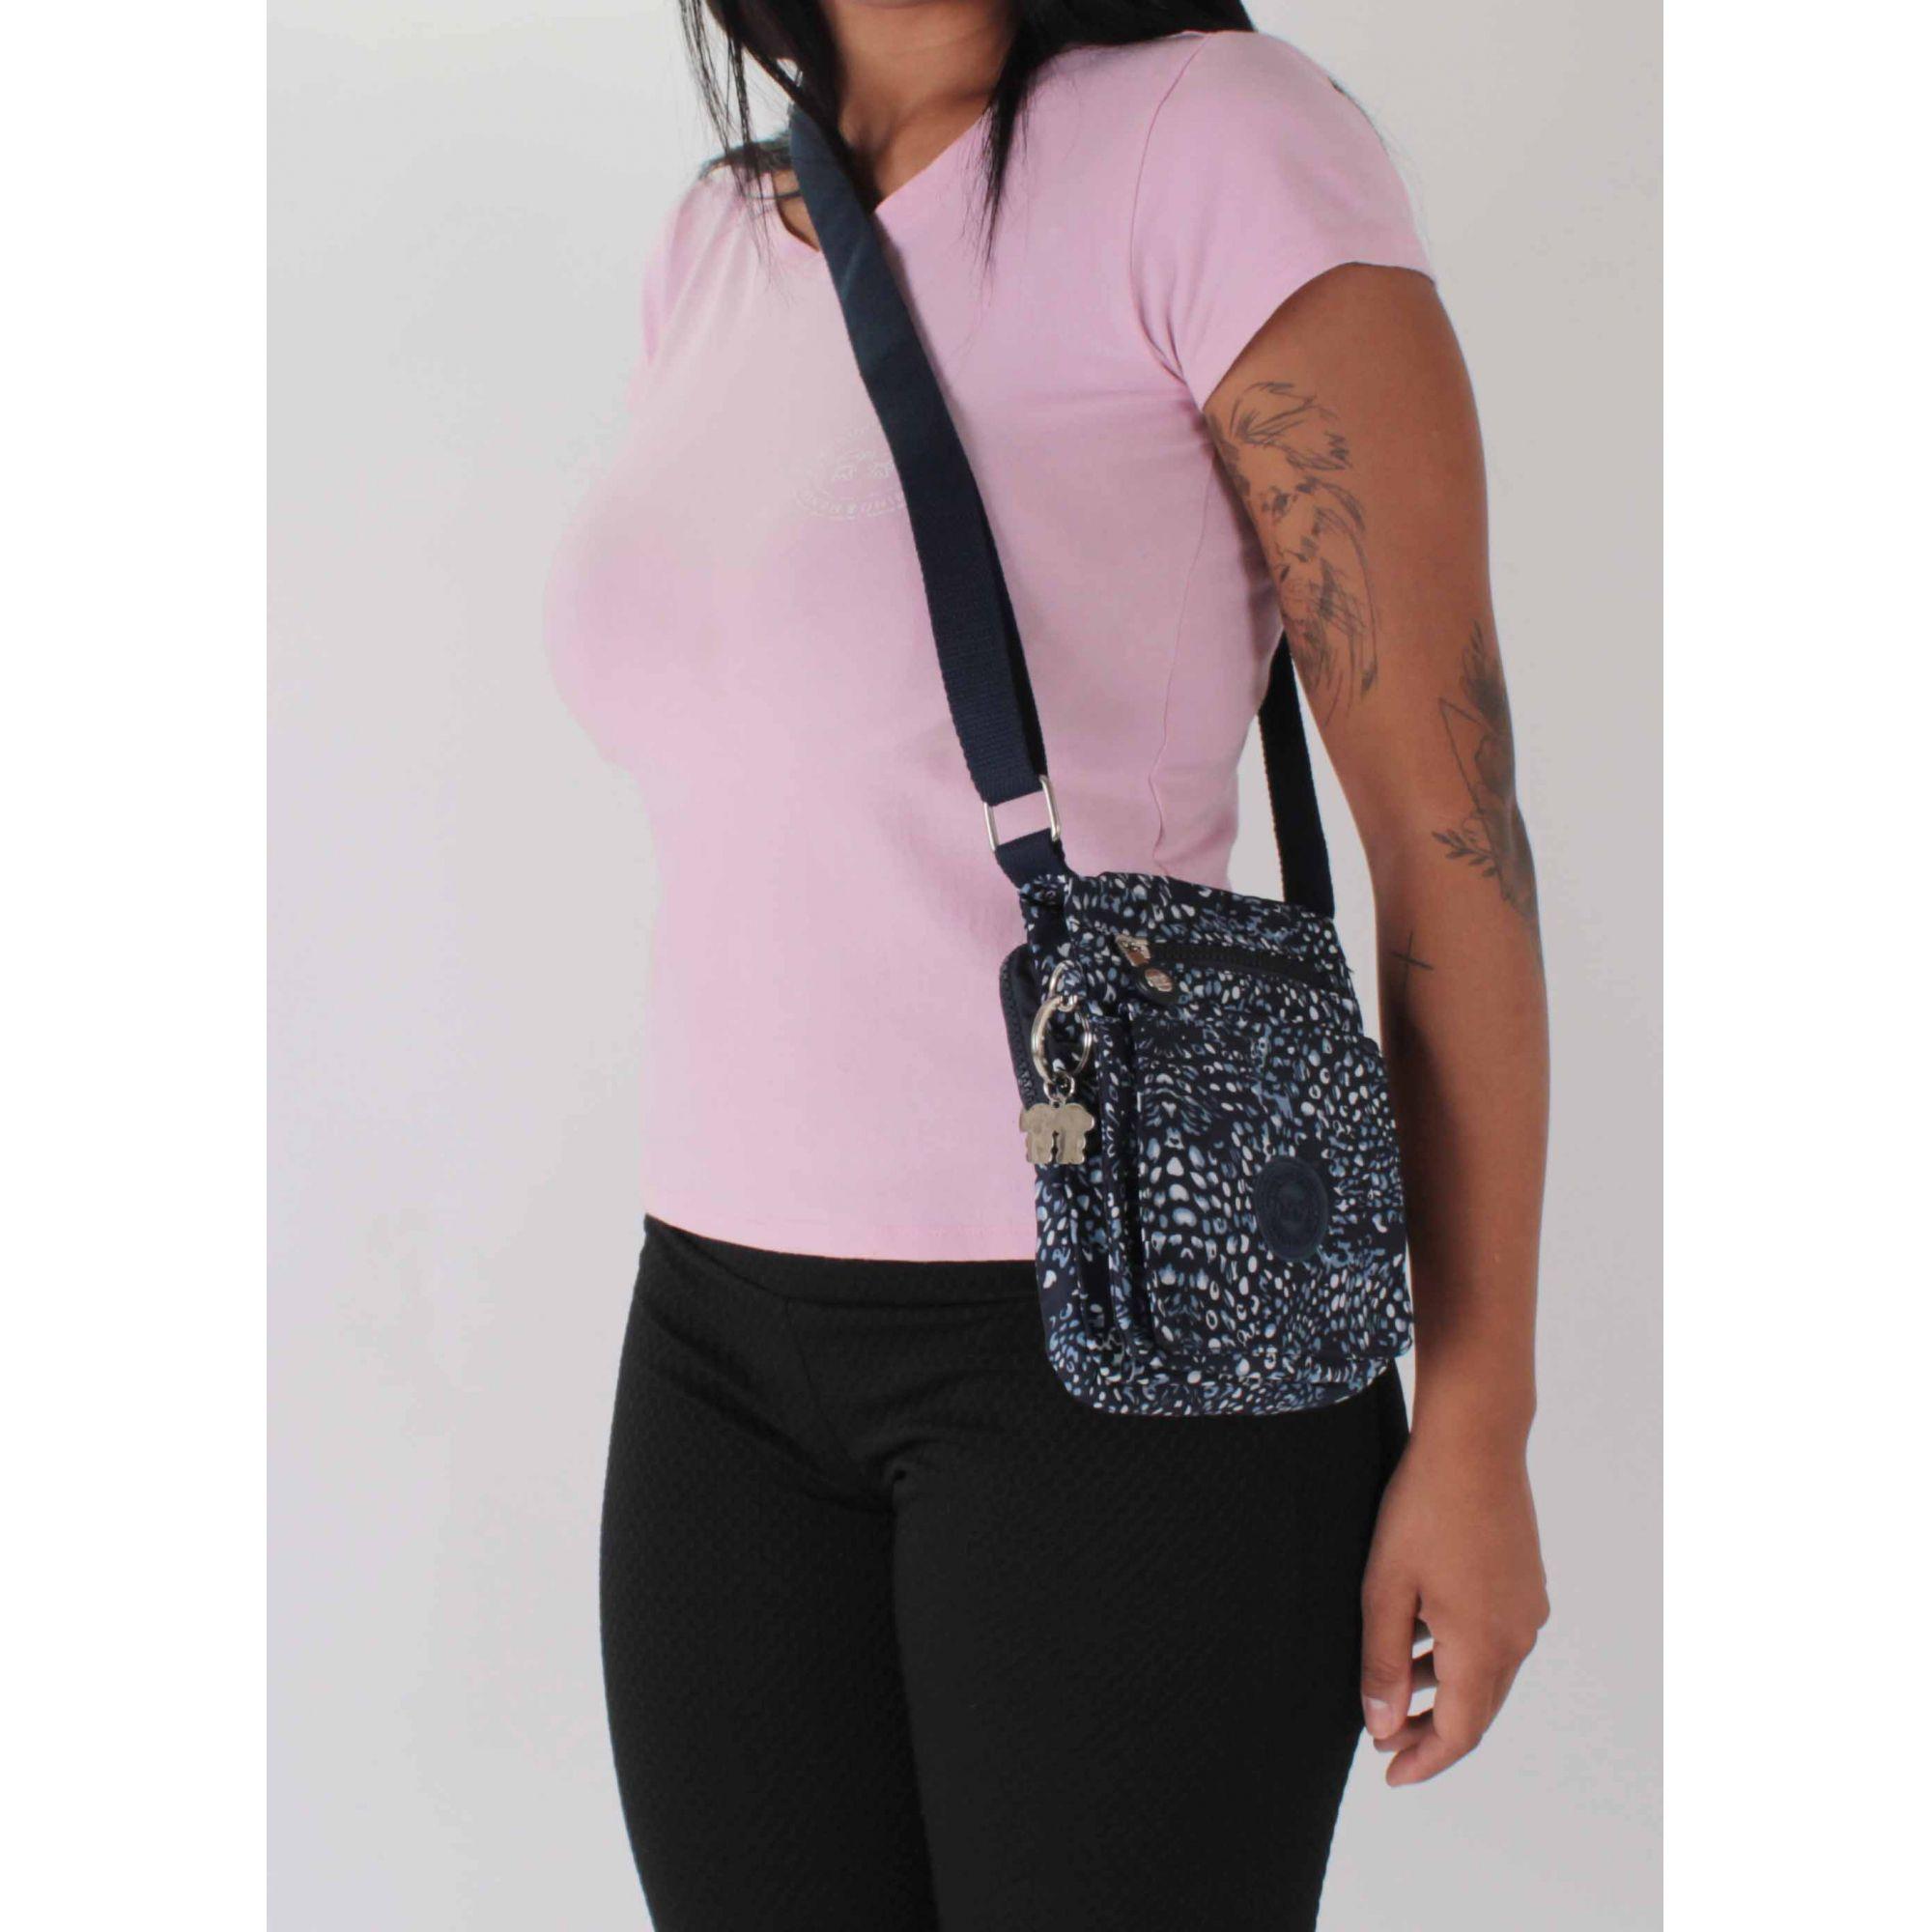 Bolsa Pequena Nylon HT6001  - Menino_Menina